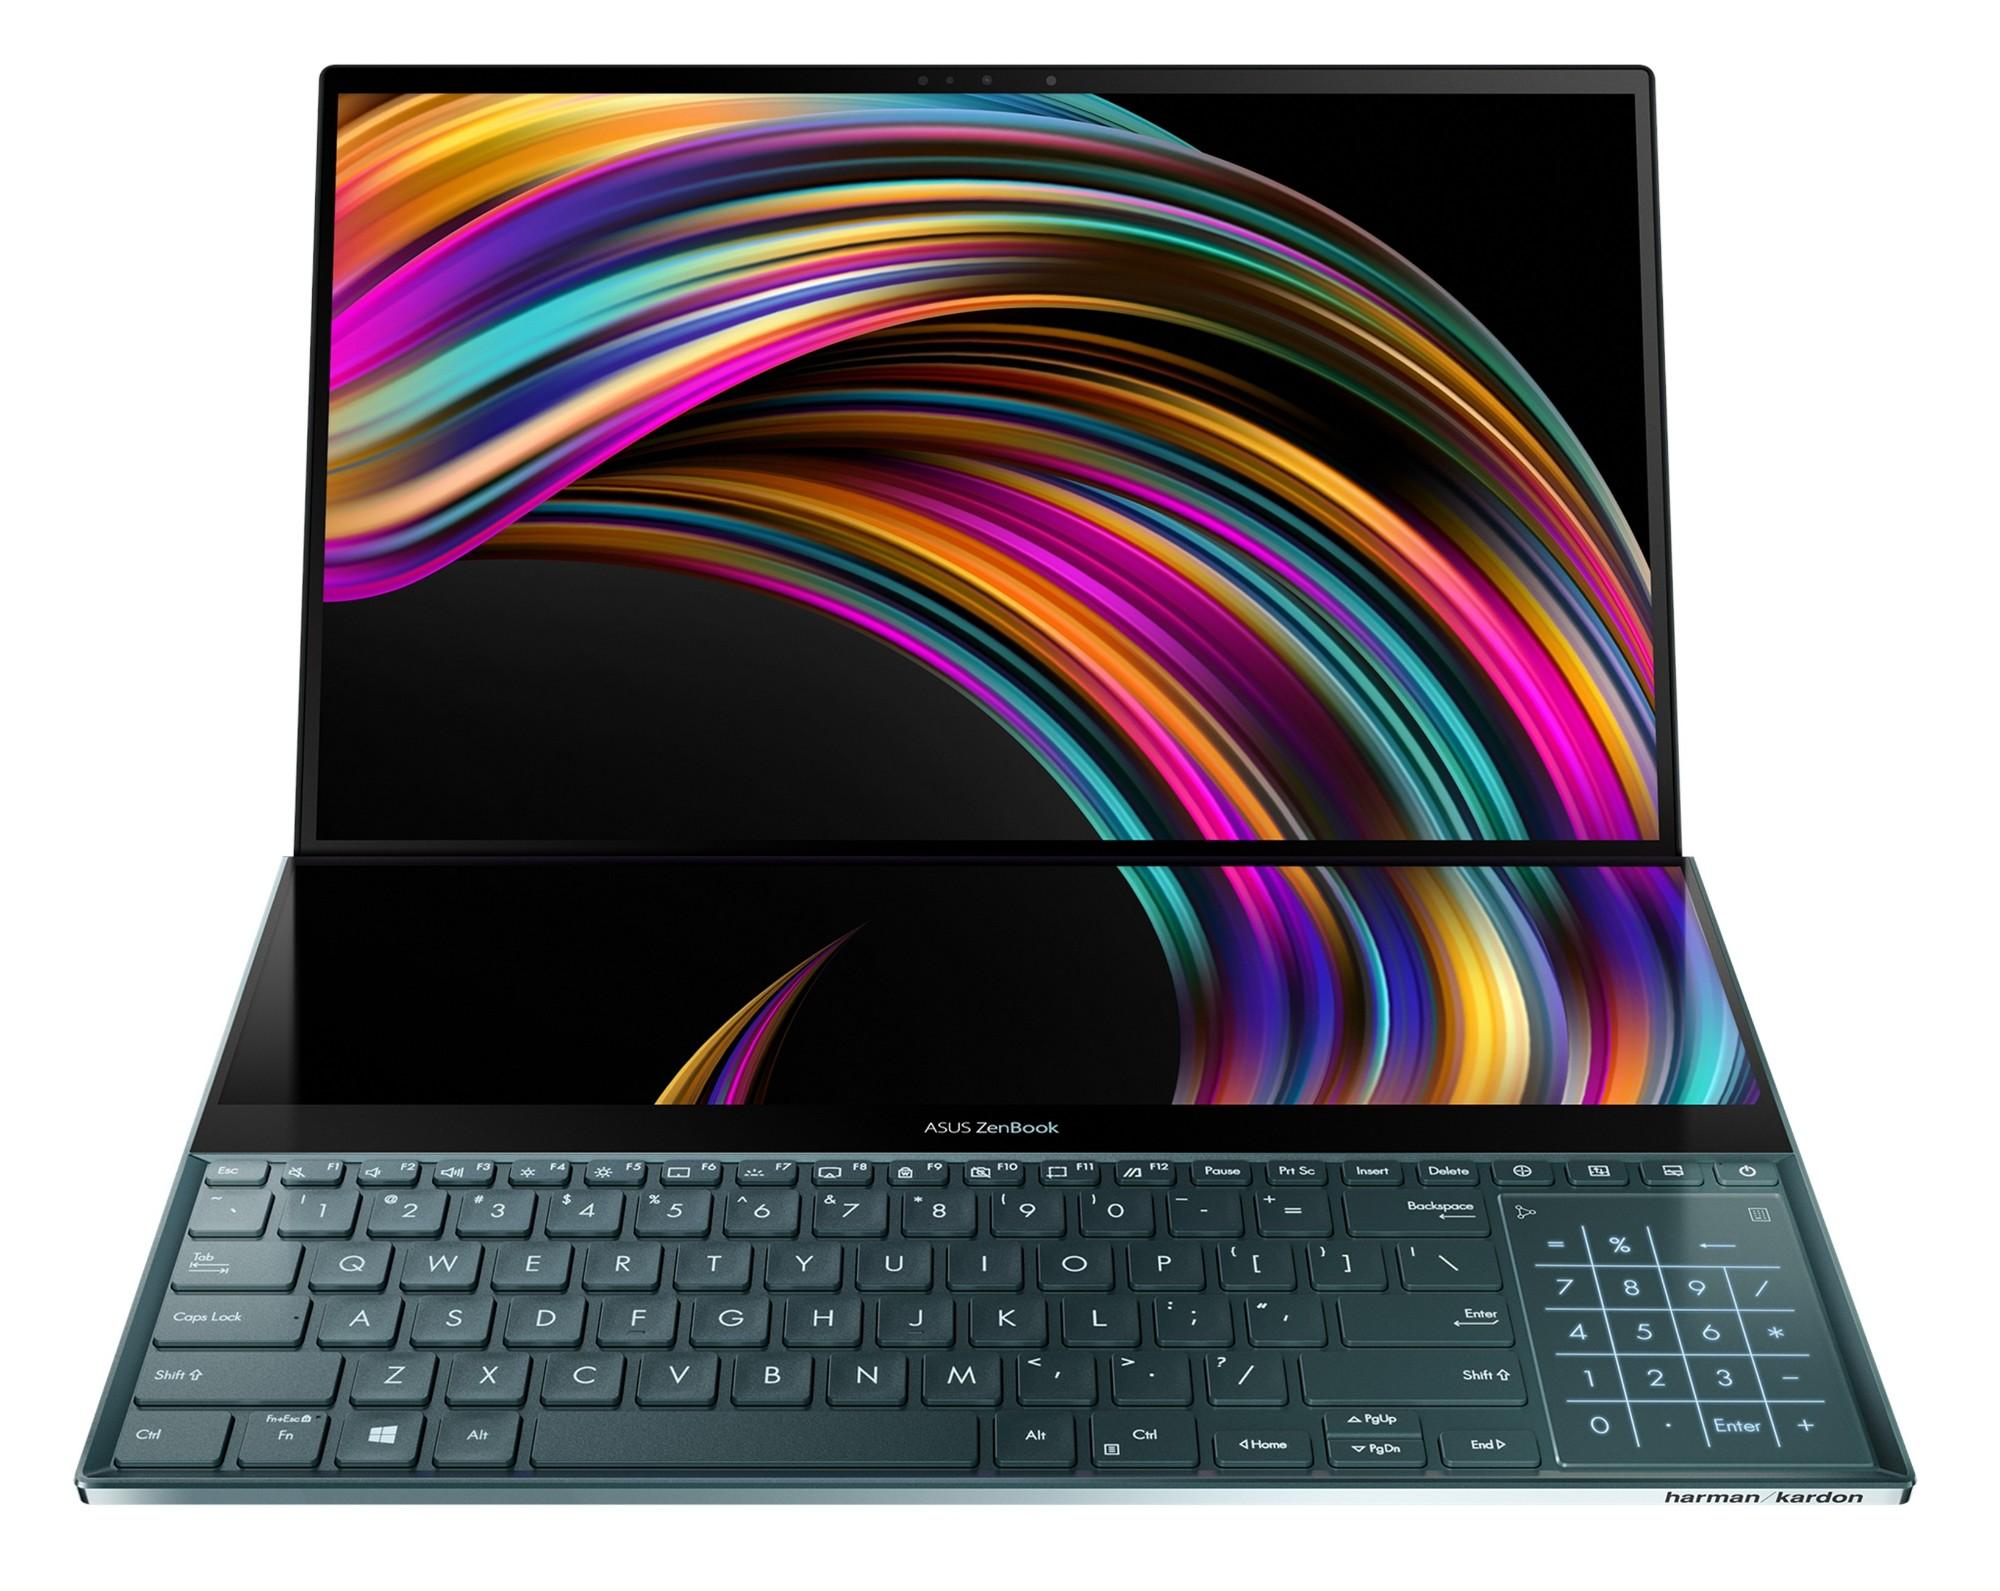 ASUS ZenBook Pro Duo UX581GV-H2001T notebook Black 39.6 cm (15.6